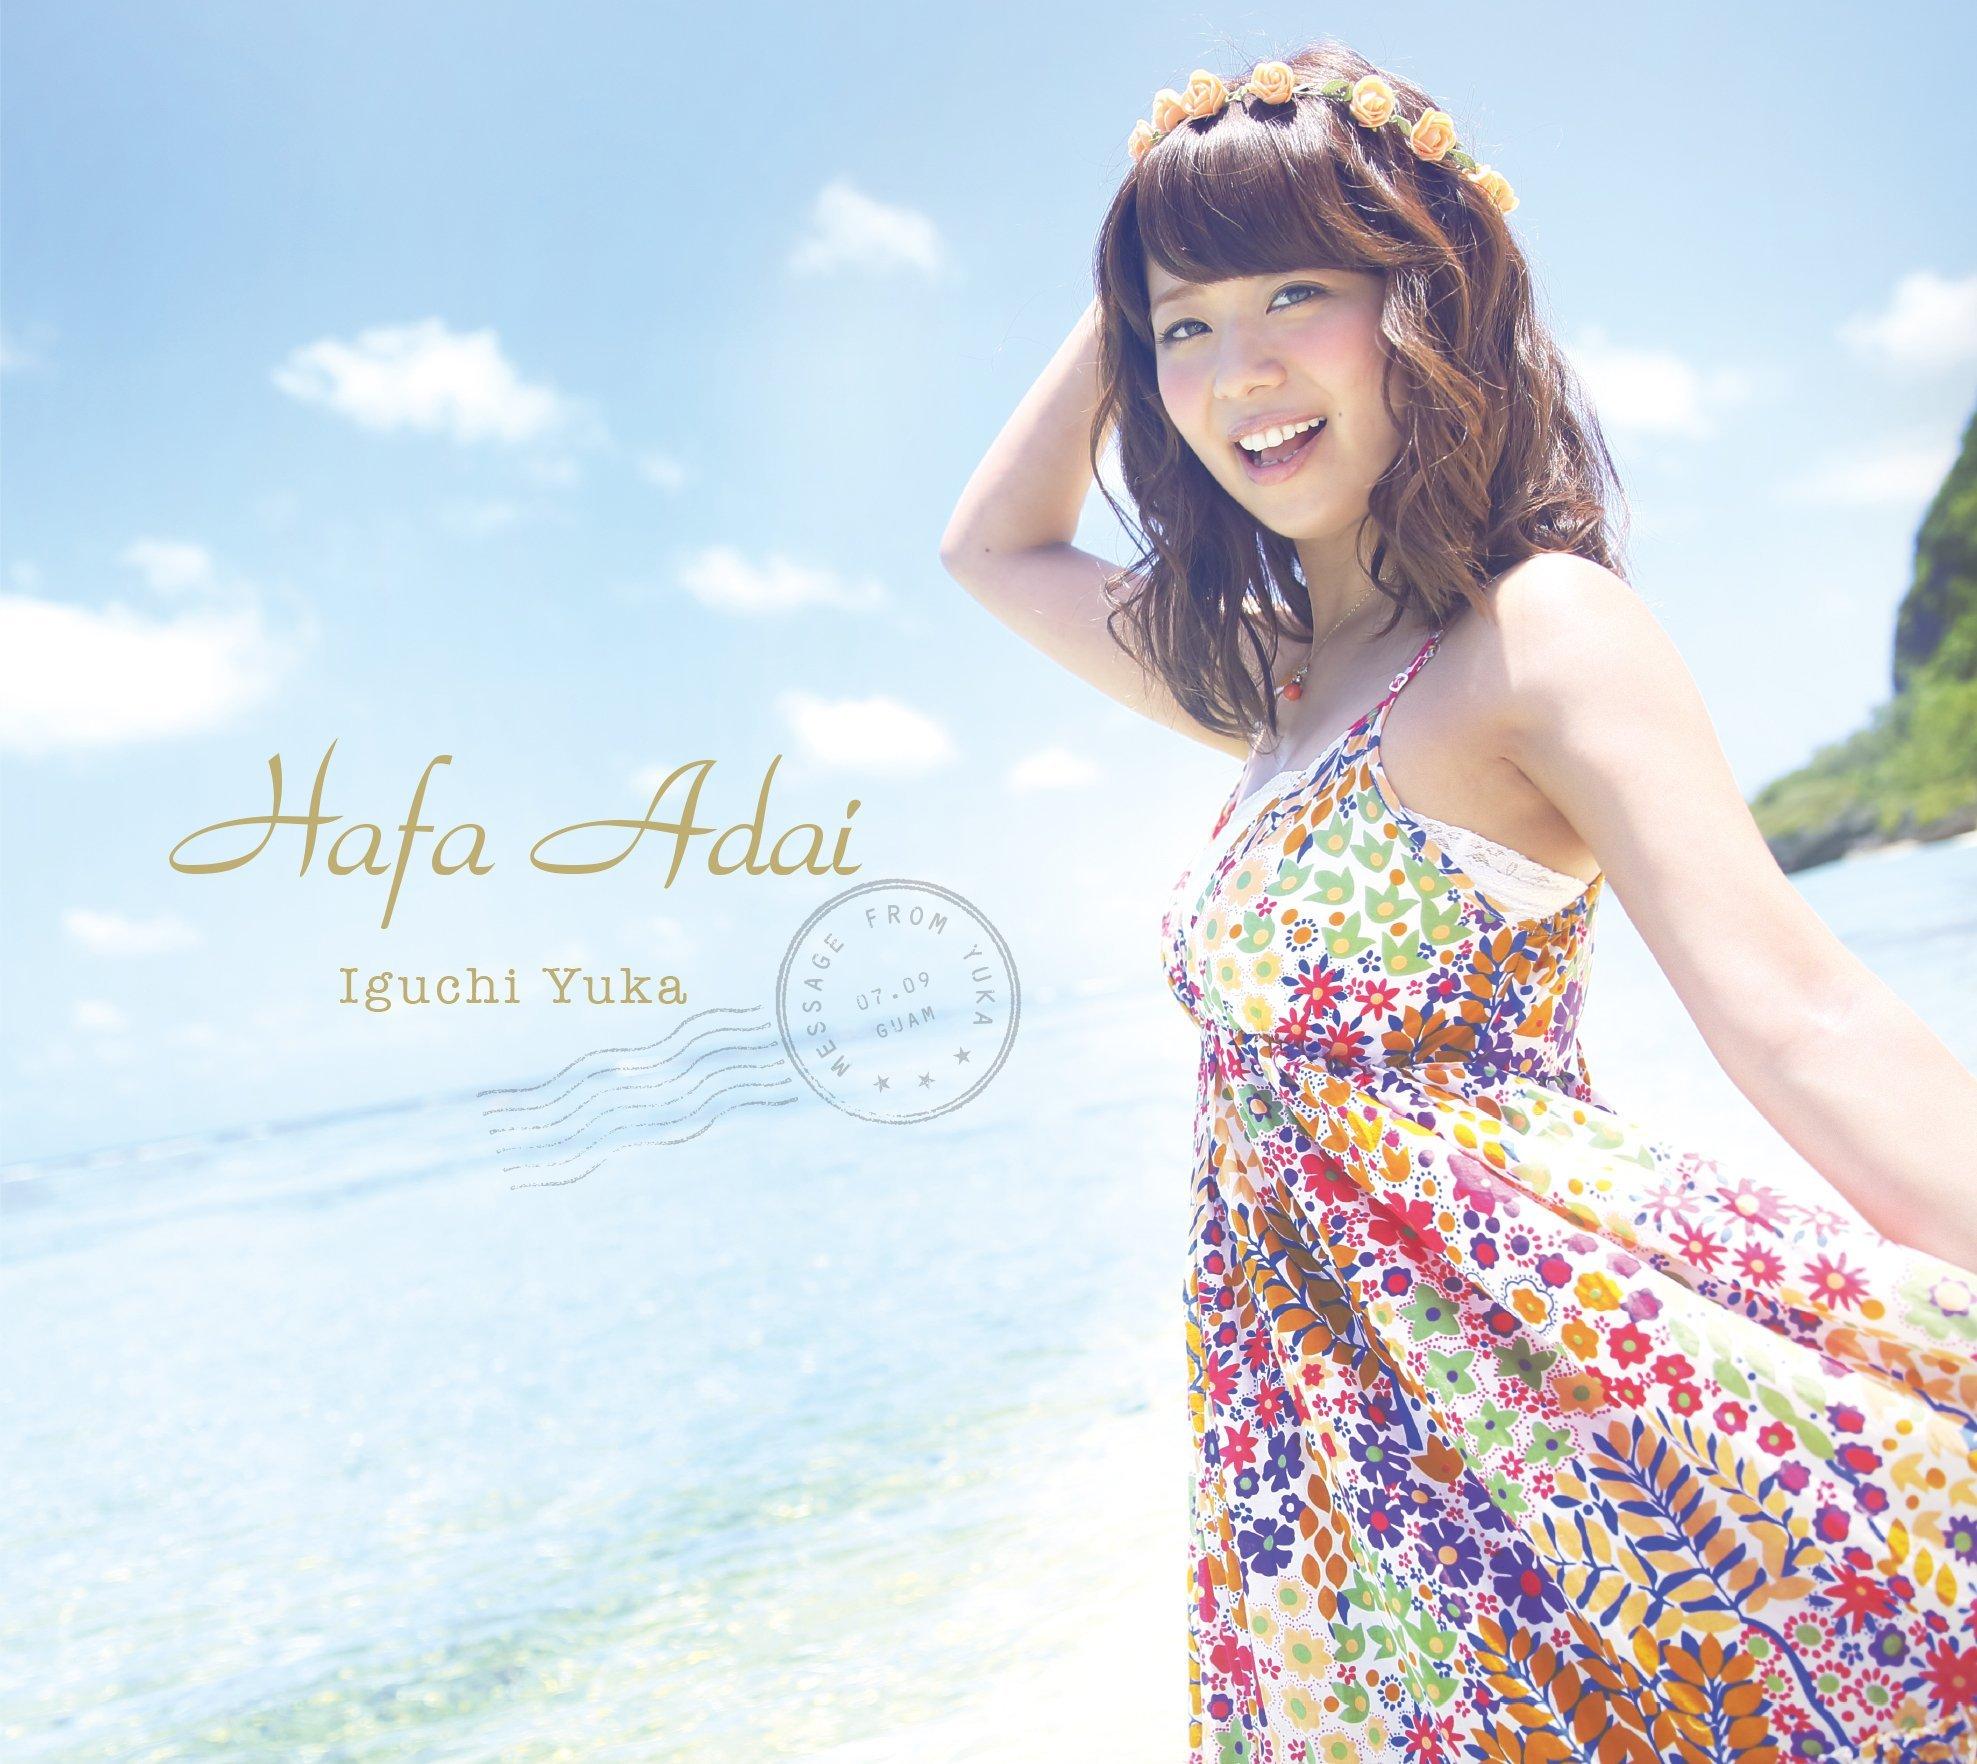 20170703.2117.9 Yuka Iguchi - Hafa Adai cover 1.jpg